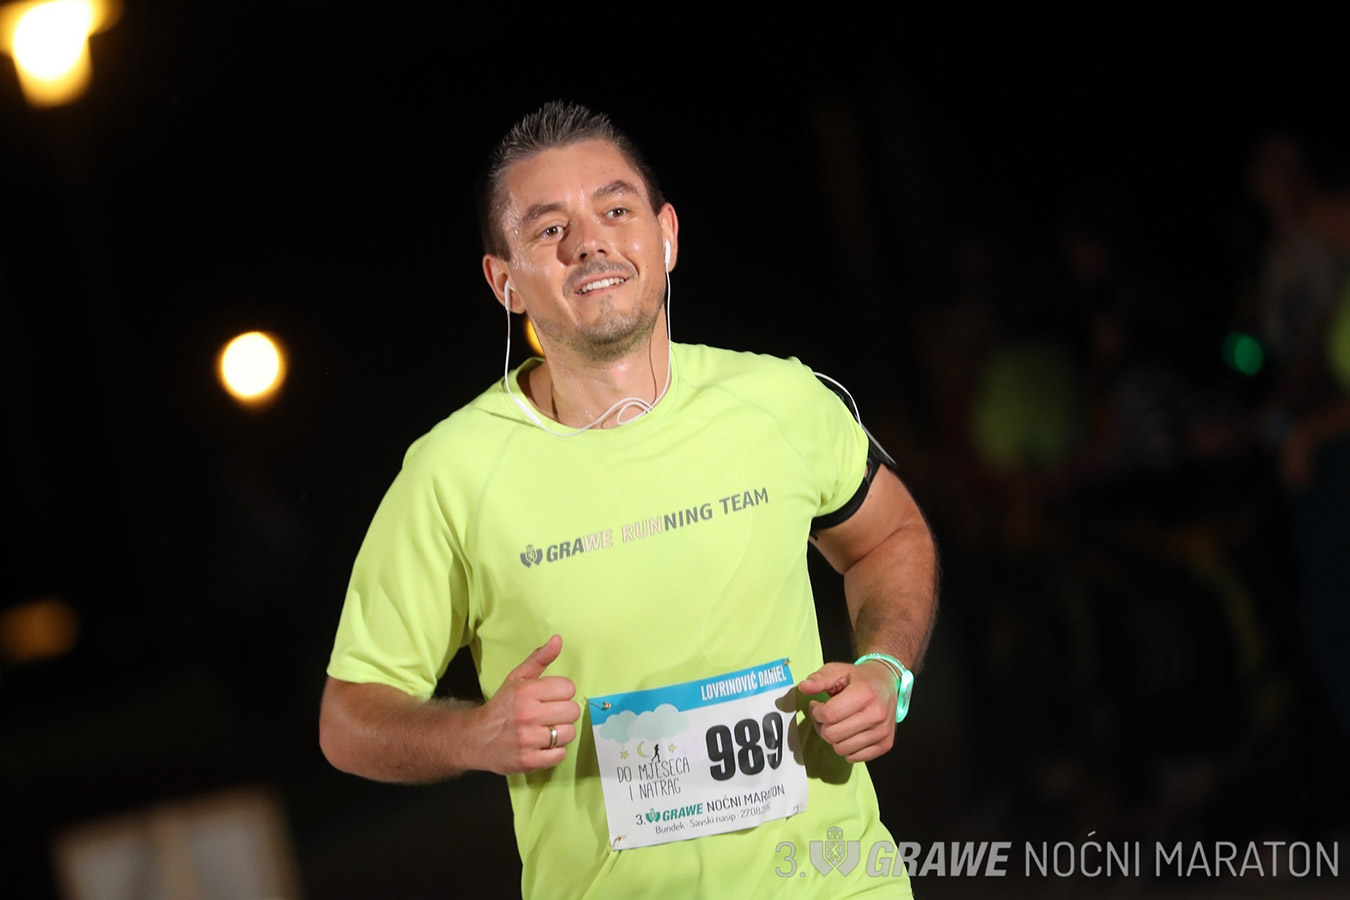 Daniel Lovrinović: Vukovarac, vatrogasac i tvrdoglav trkač